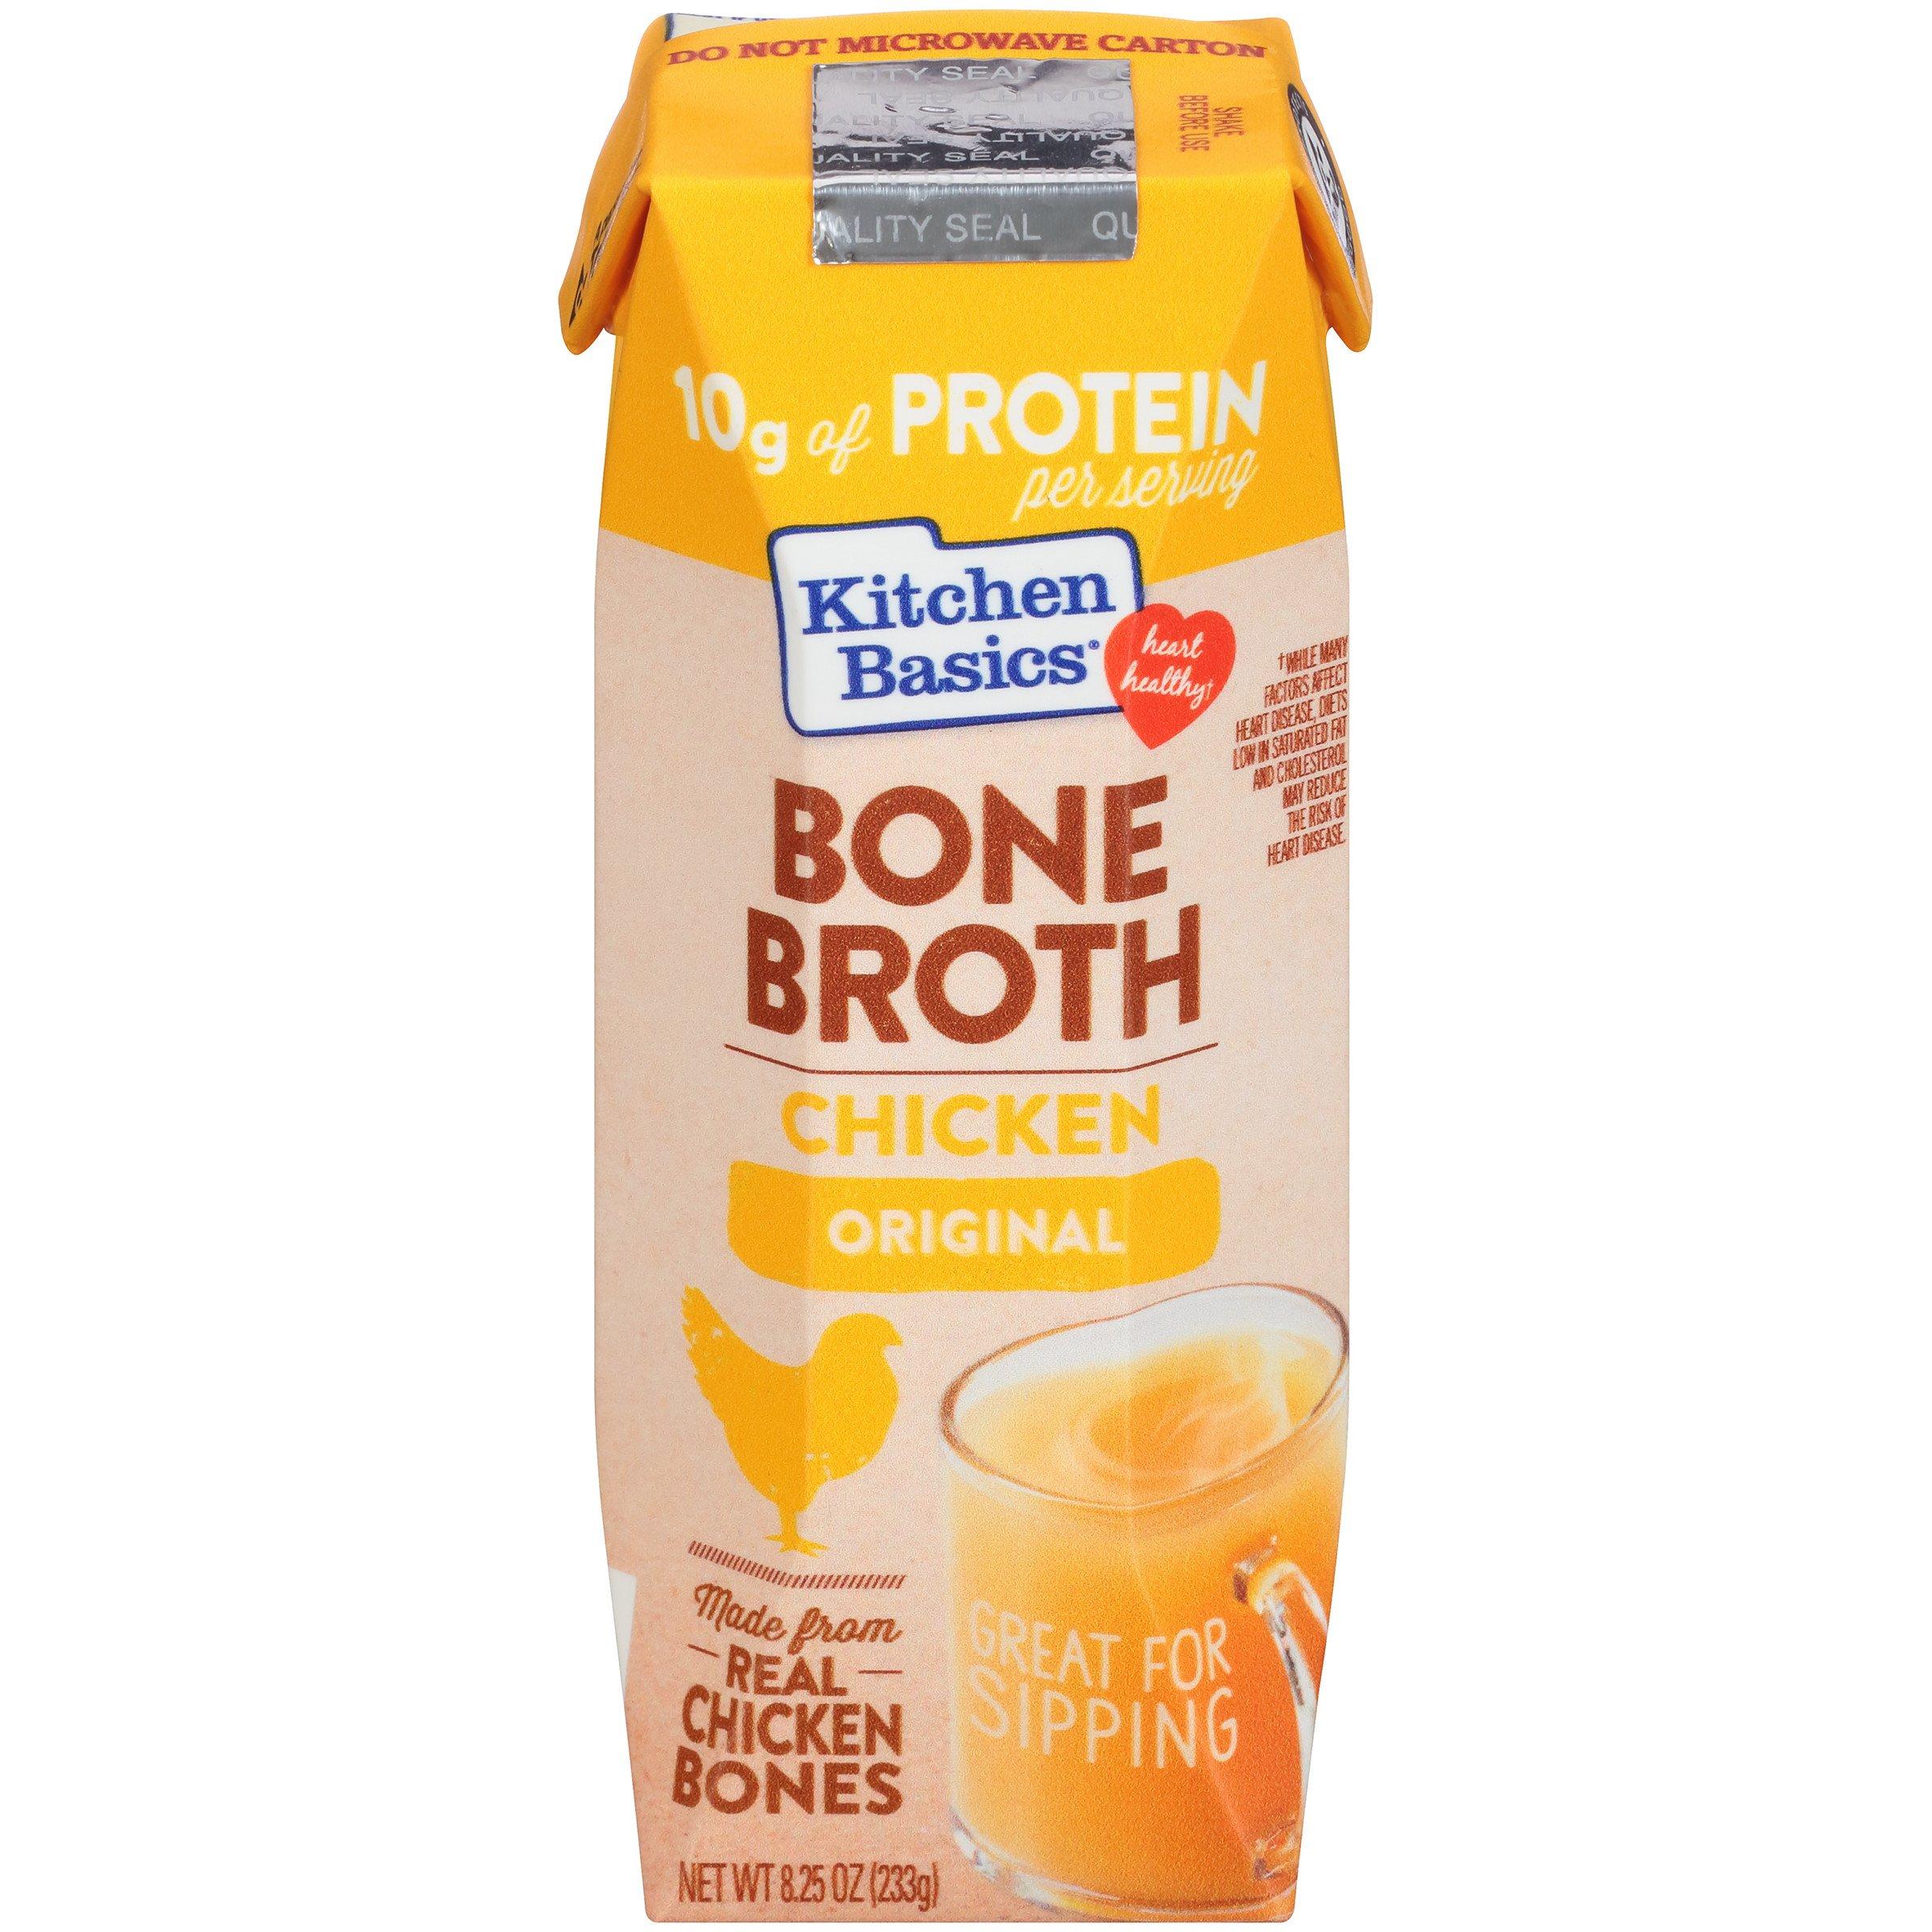 Pacific Foods Organic Bone Broth Original Chicken, 8 oz: Amazon.com: Grocery & Gourmet Food